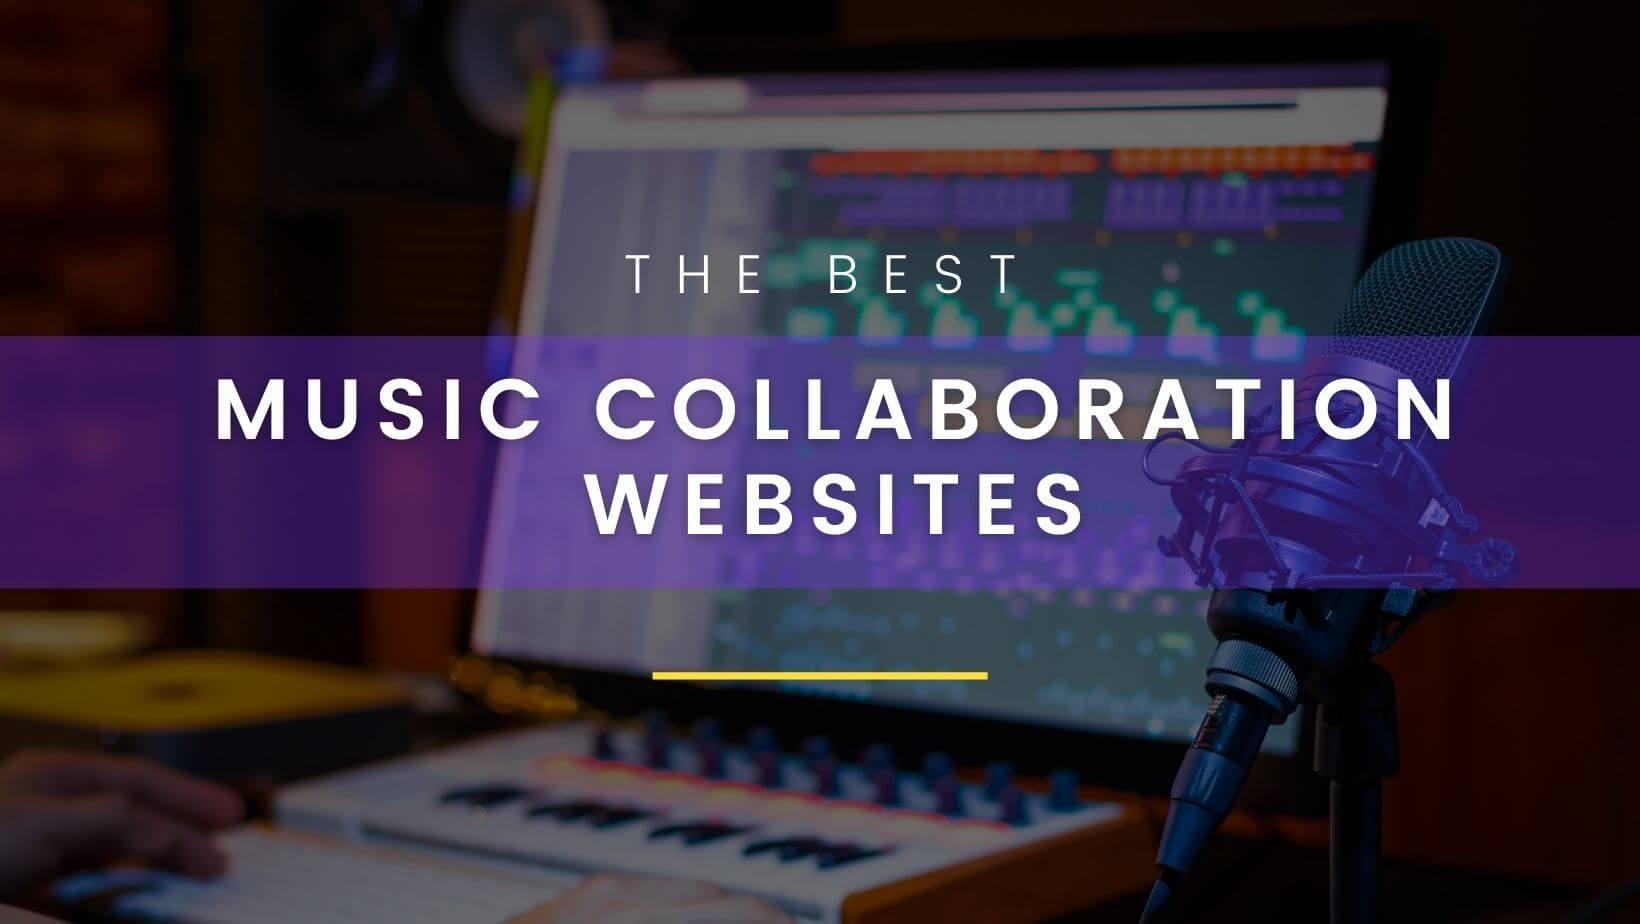 Best music collaboration websites